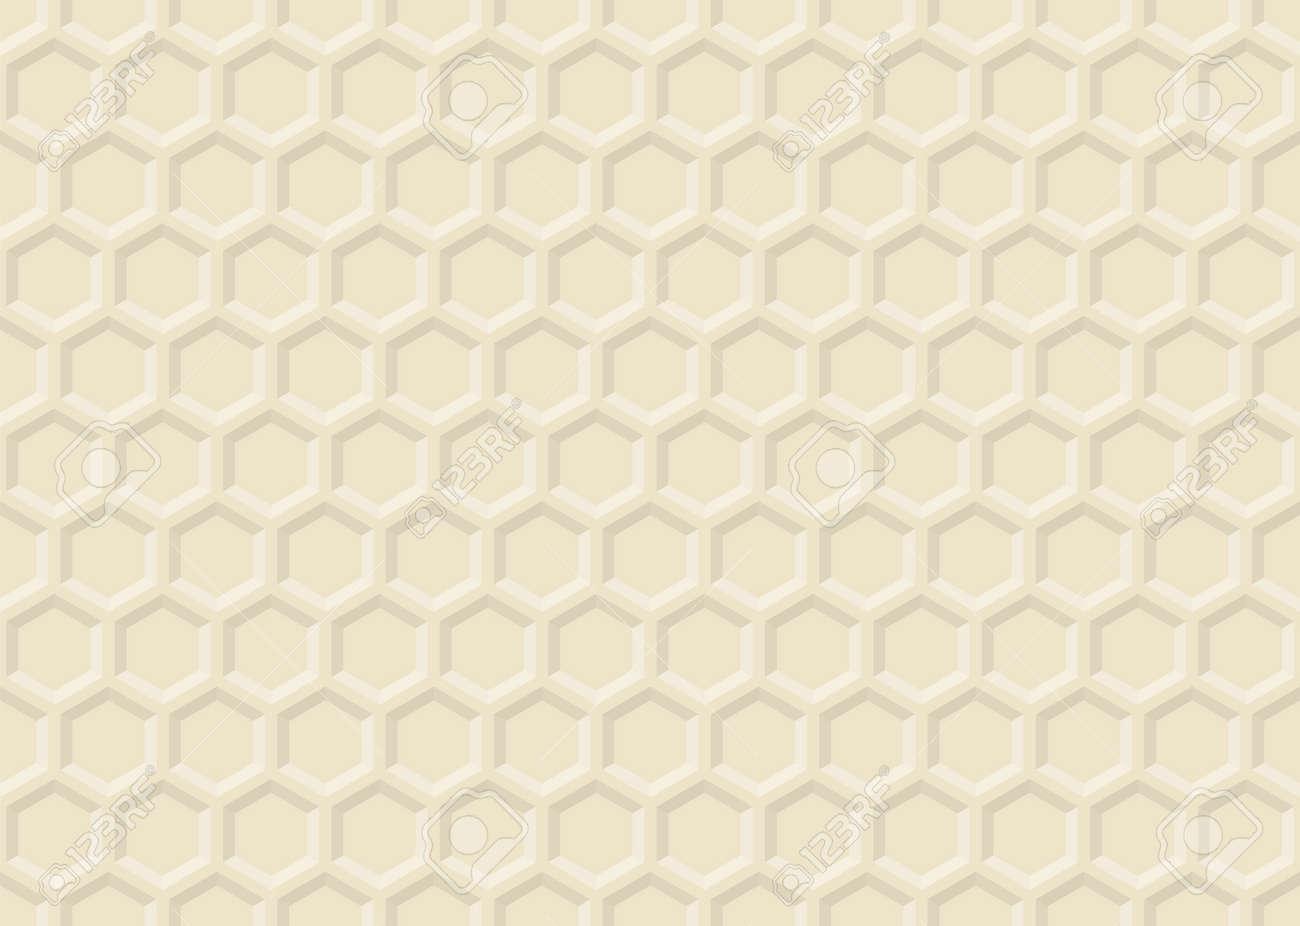 Beehive ornament - Ornament Honey Vector Decorative Pattern Honeycomb Propolis Background Beehive Texture Honeyed Hexagon Stock Vector 52854465